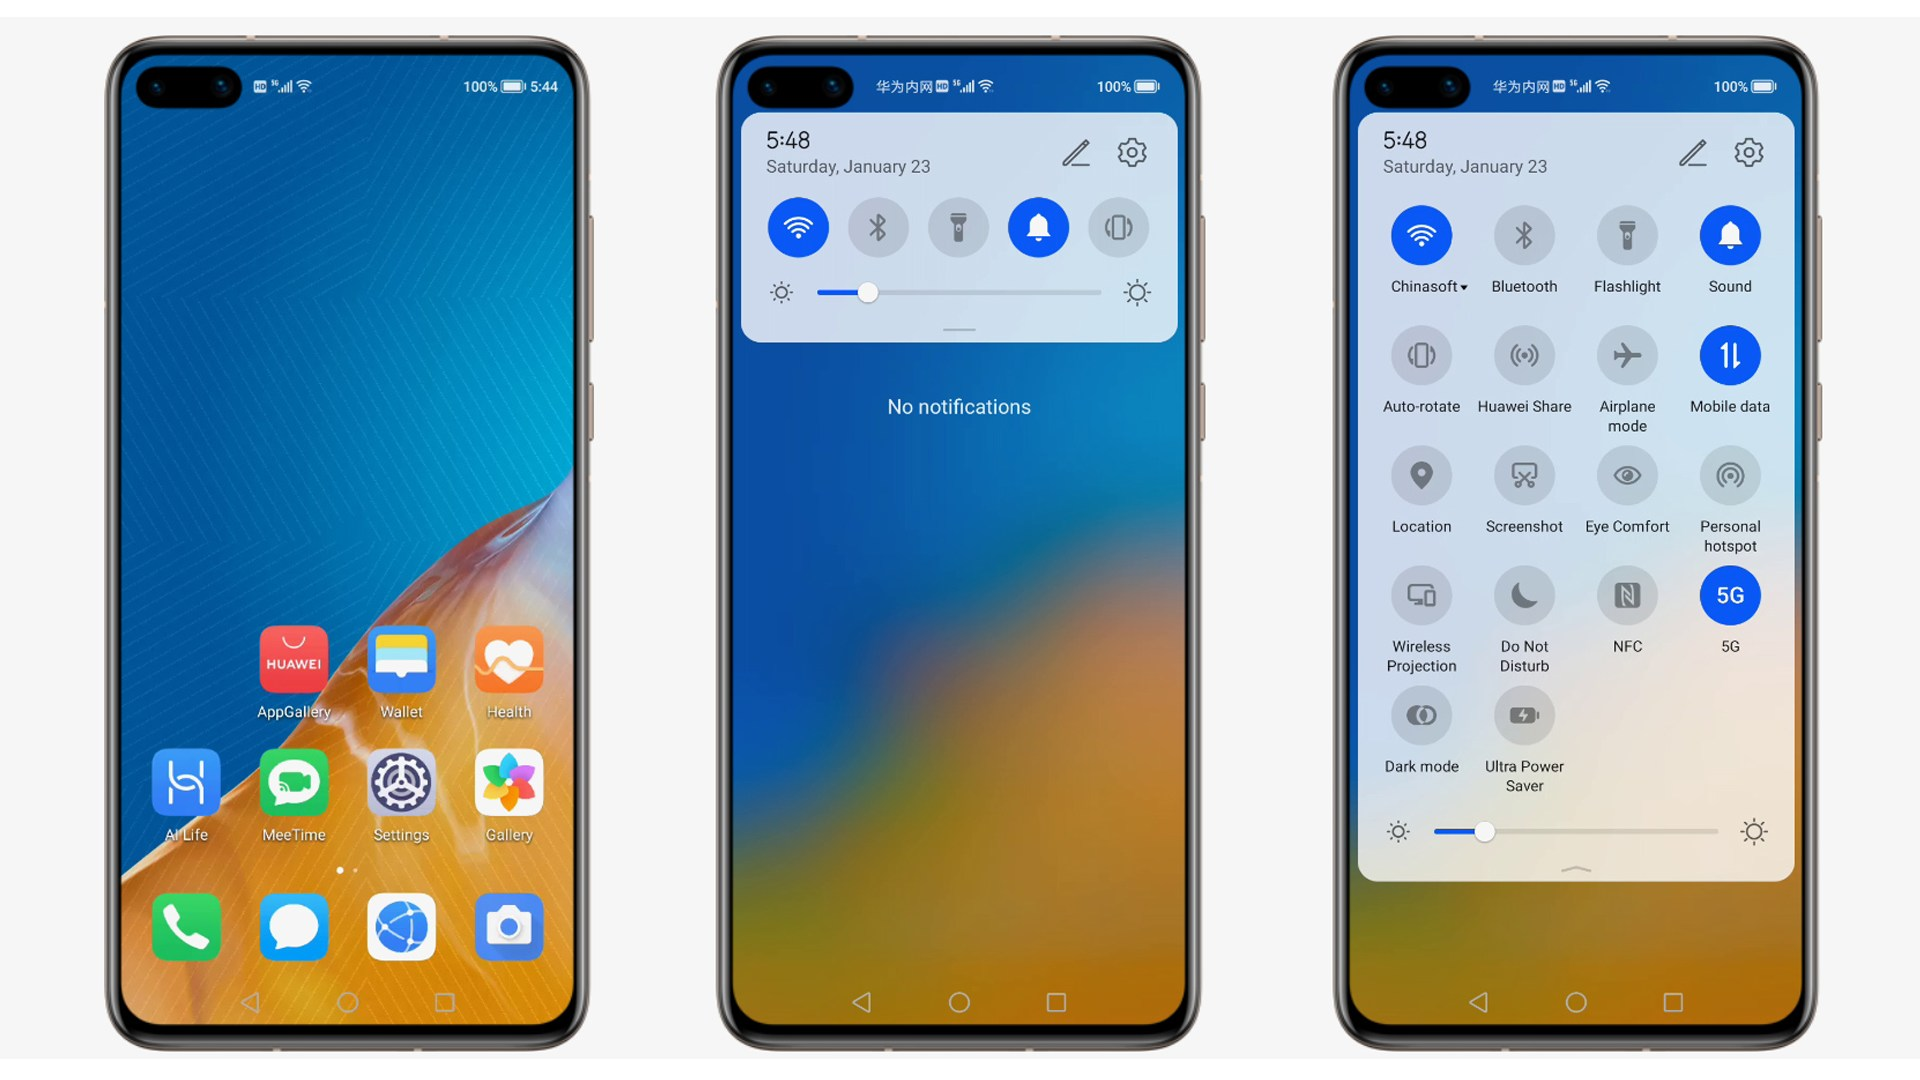 Betriebssystem, Huawei, Beta, Oberfläche, Android 10, Screenshot, Vorabversion, EMUI 10, Huawei P40, HarmonyOS, Harmony, EMUI10, Harmony OS 2.0, Harmony OS 2.0 Beta